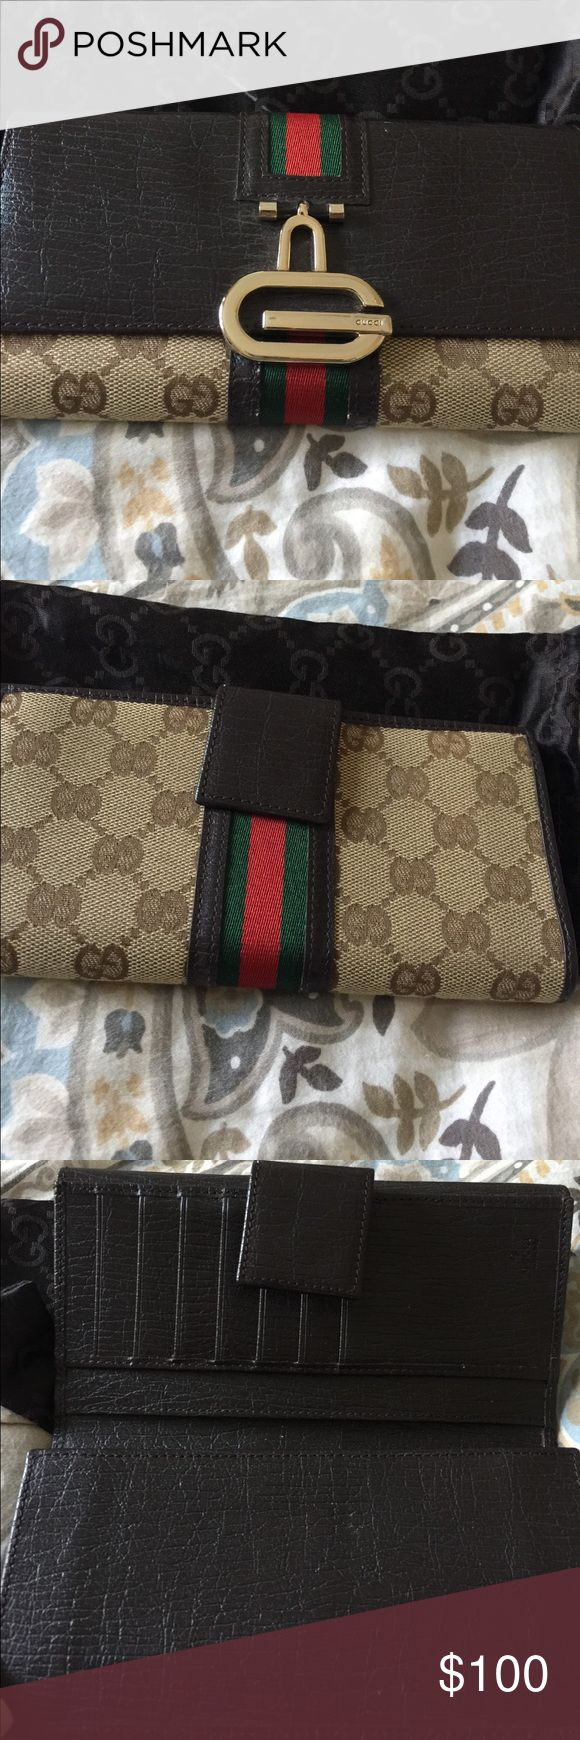 Gucci Wallet Authentic Gucci Wallet Gucci Bags Wallets